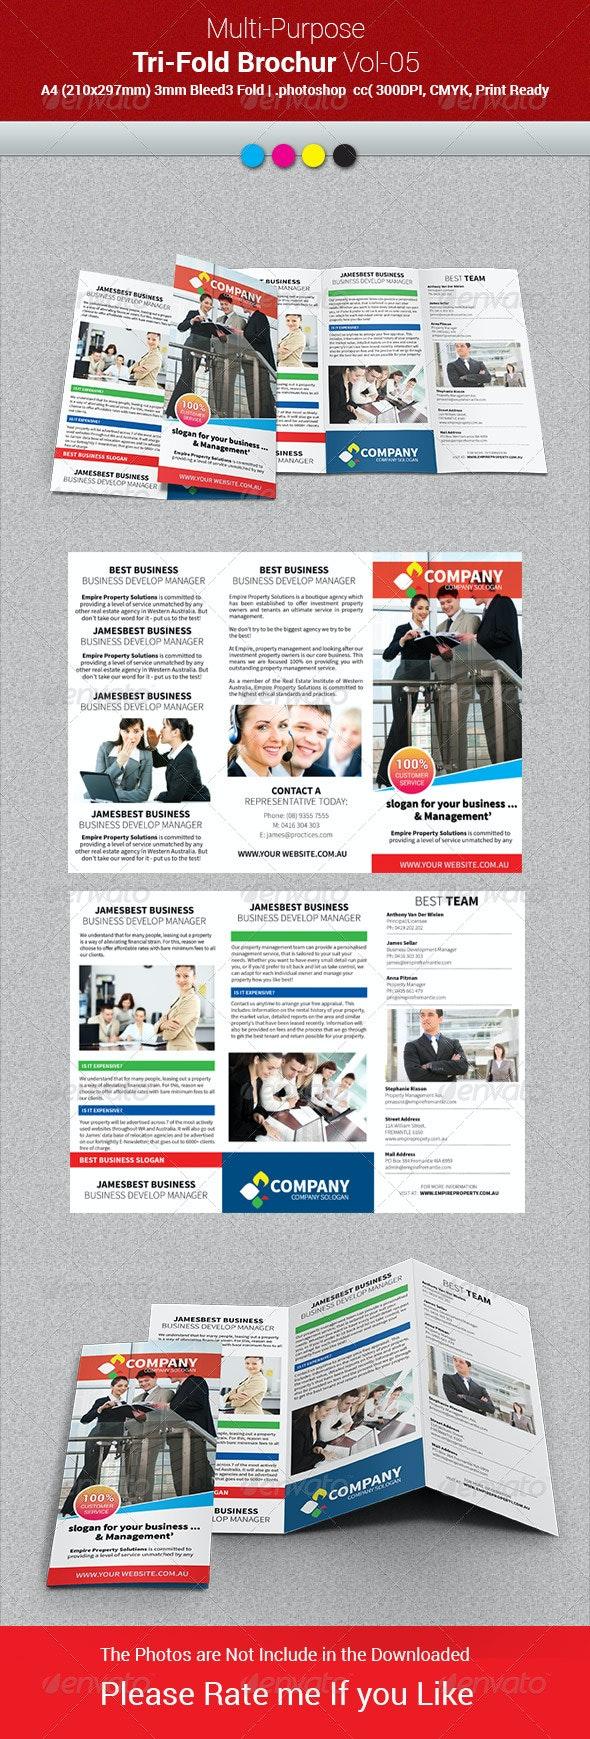 Multipurpose Business Tri-Fold Brochure Vol-05 - Corporate Brochures